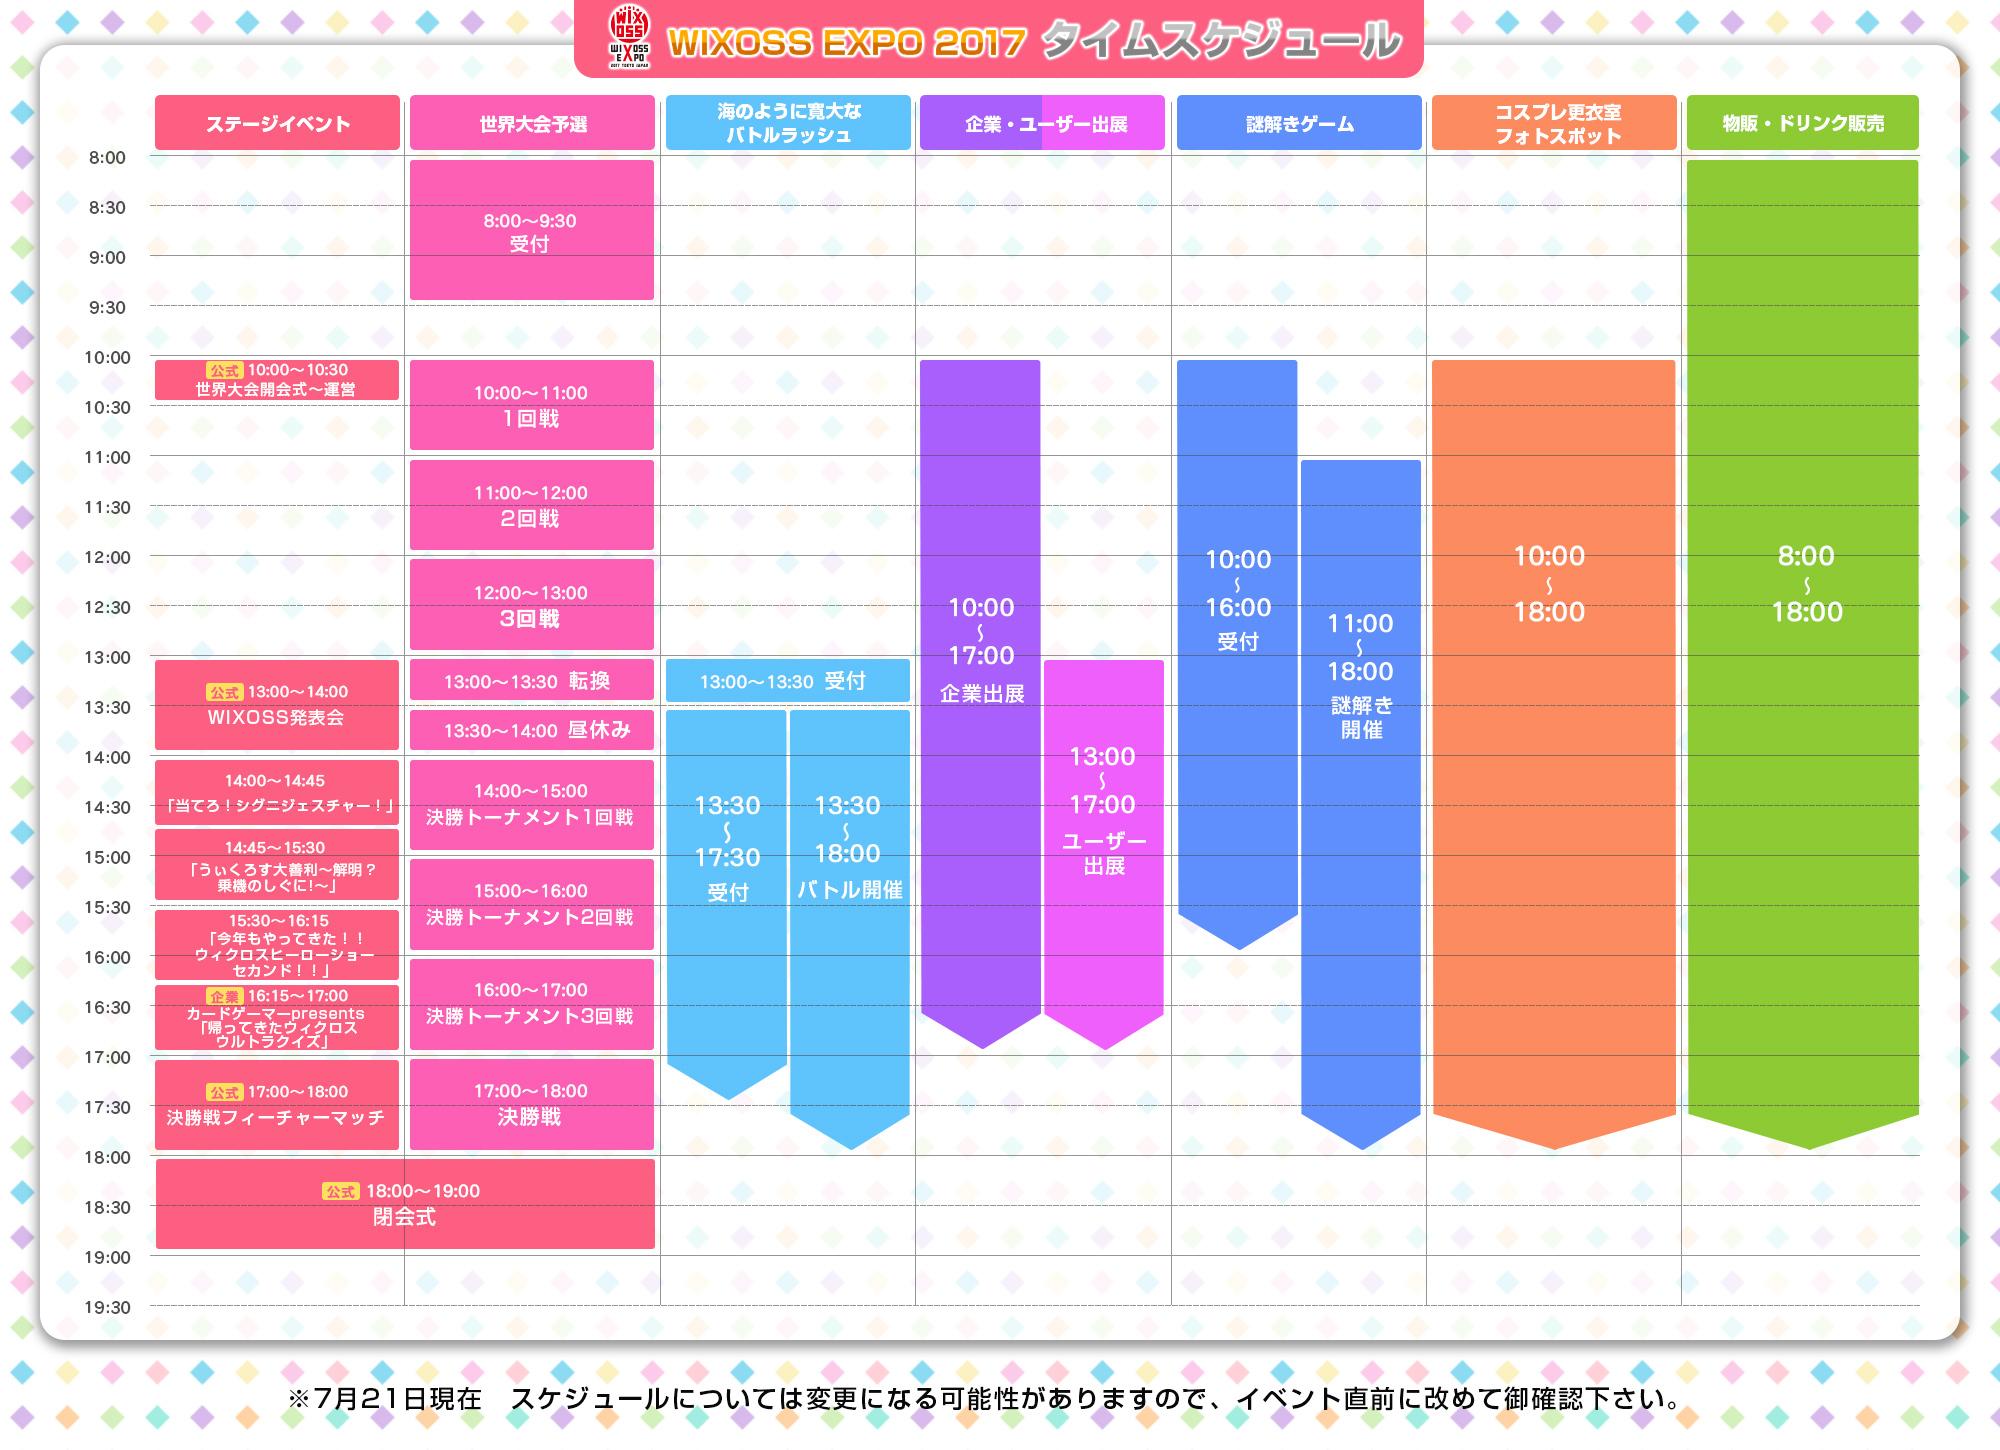 「WIXOSS EXPO」タイムスケジュール